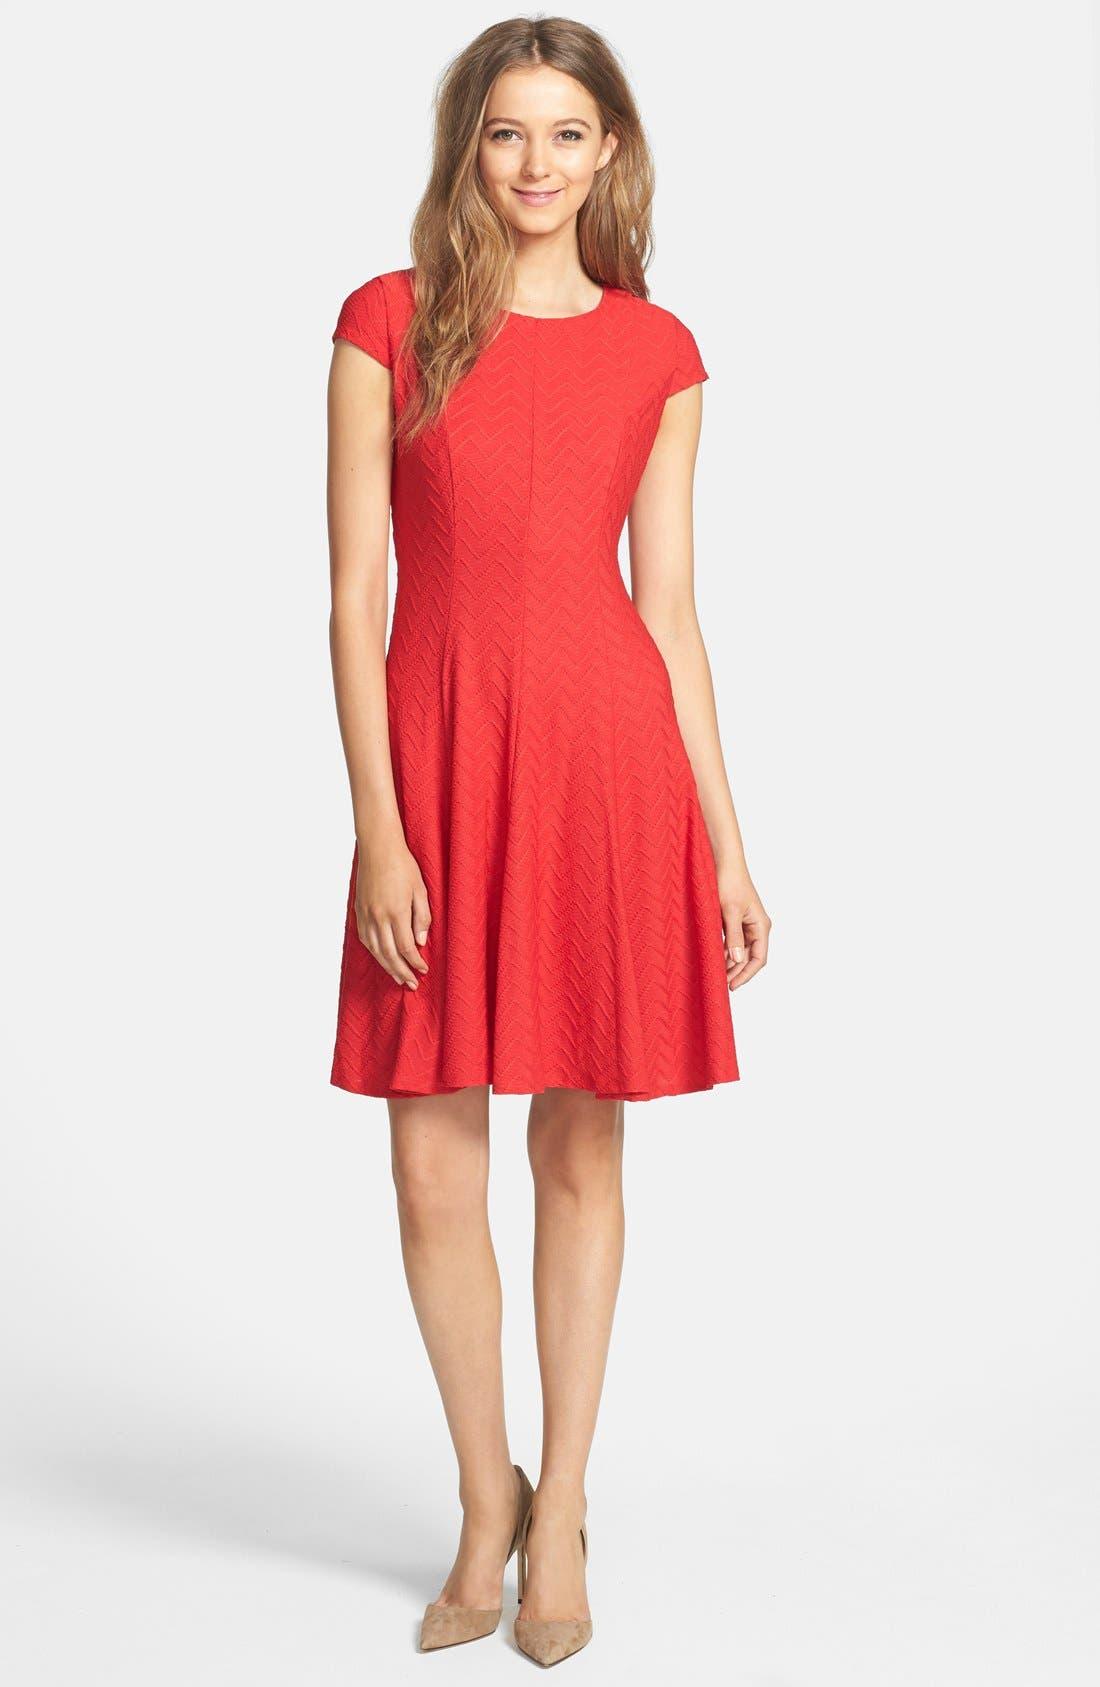 Alternate Image 3  - Eliza J Textured Knit Fit & Flare Dress (Petite)